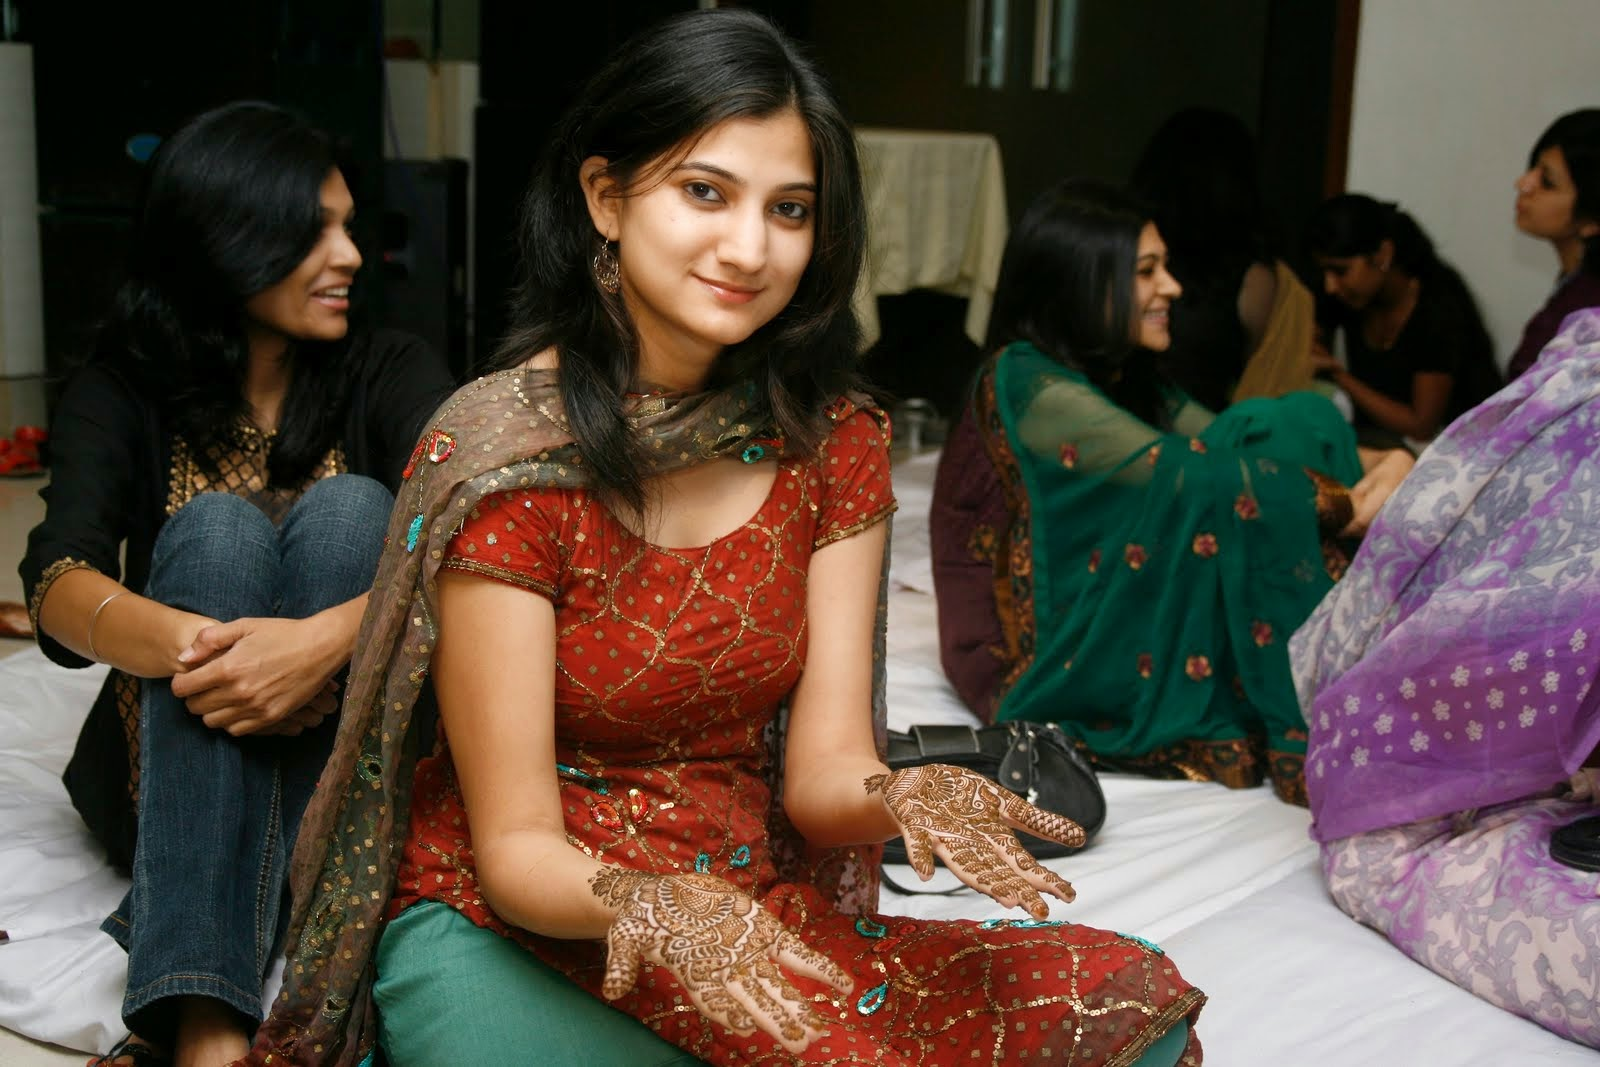 Pakistani Shadi And Marriage Hot Girls New Photos -6344